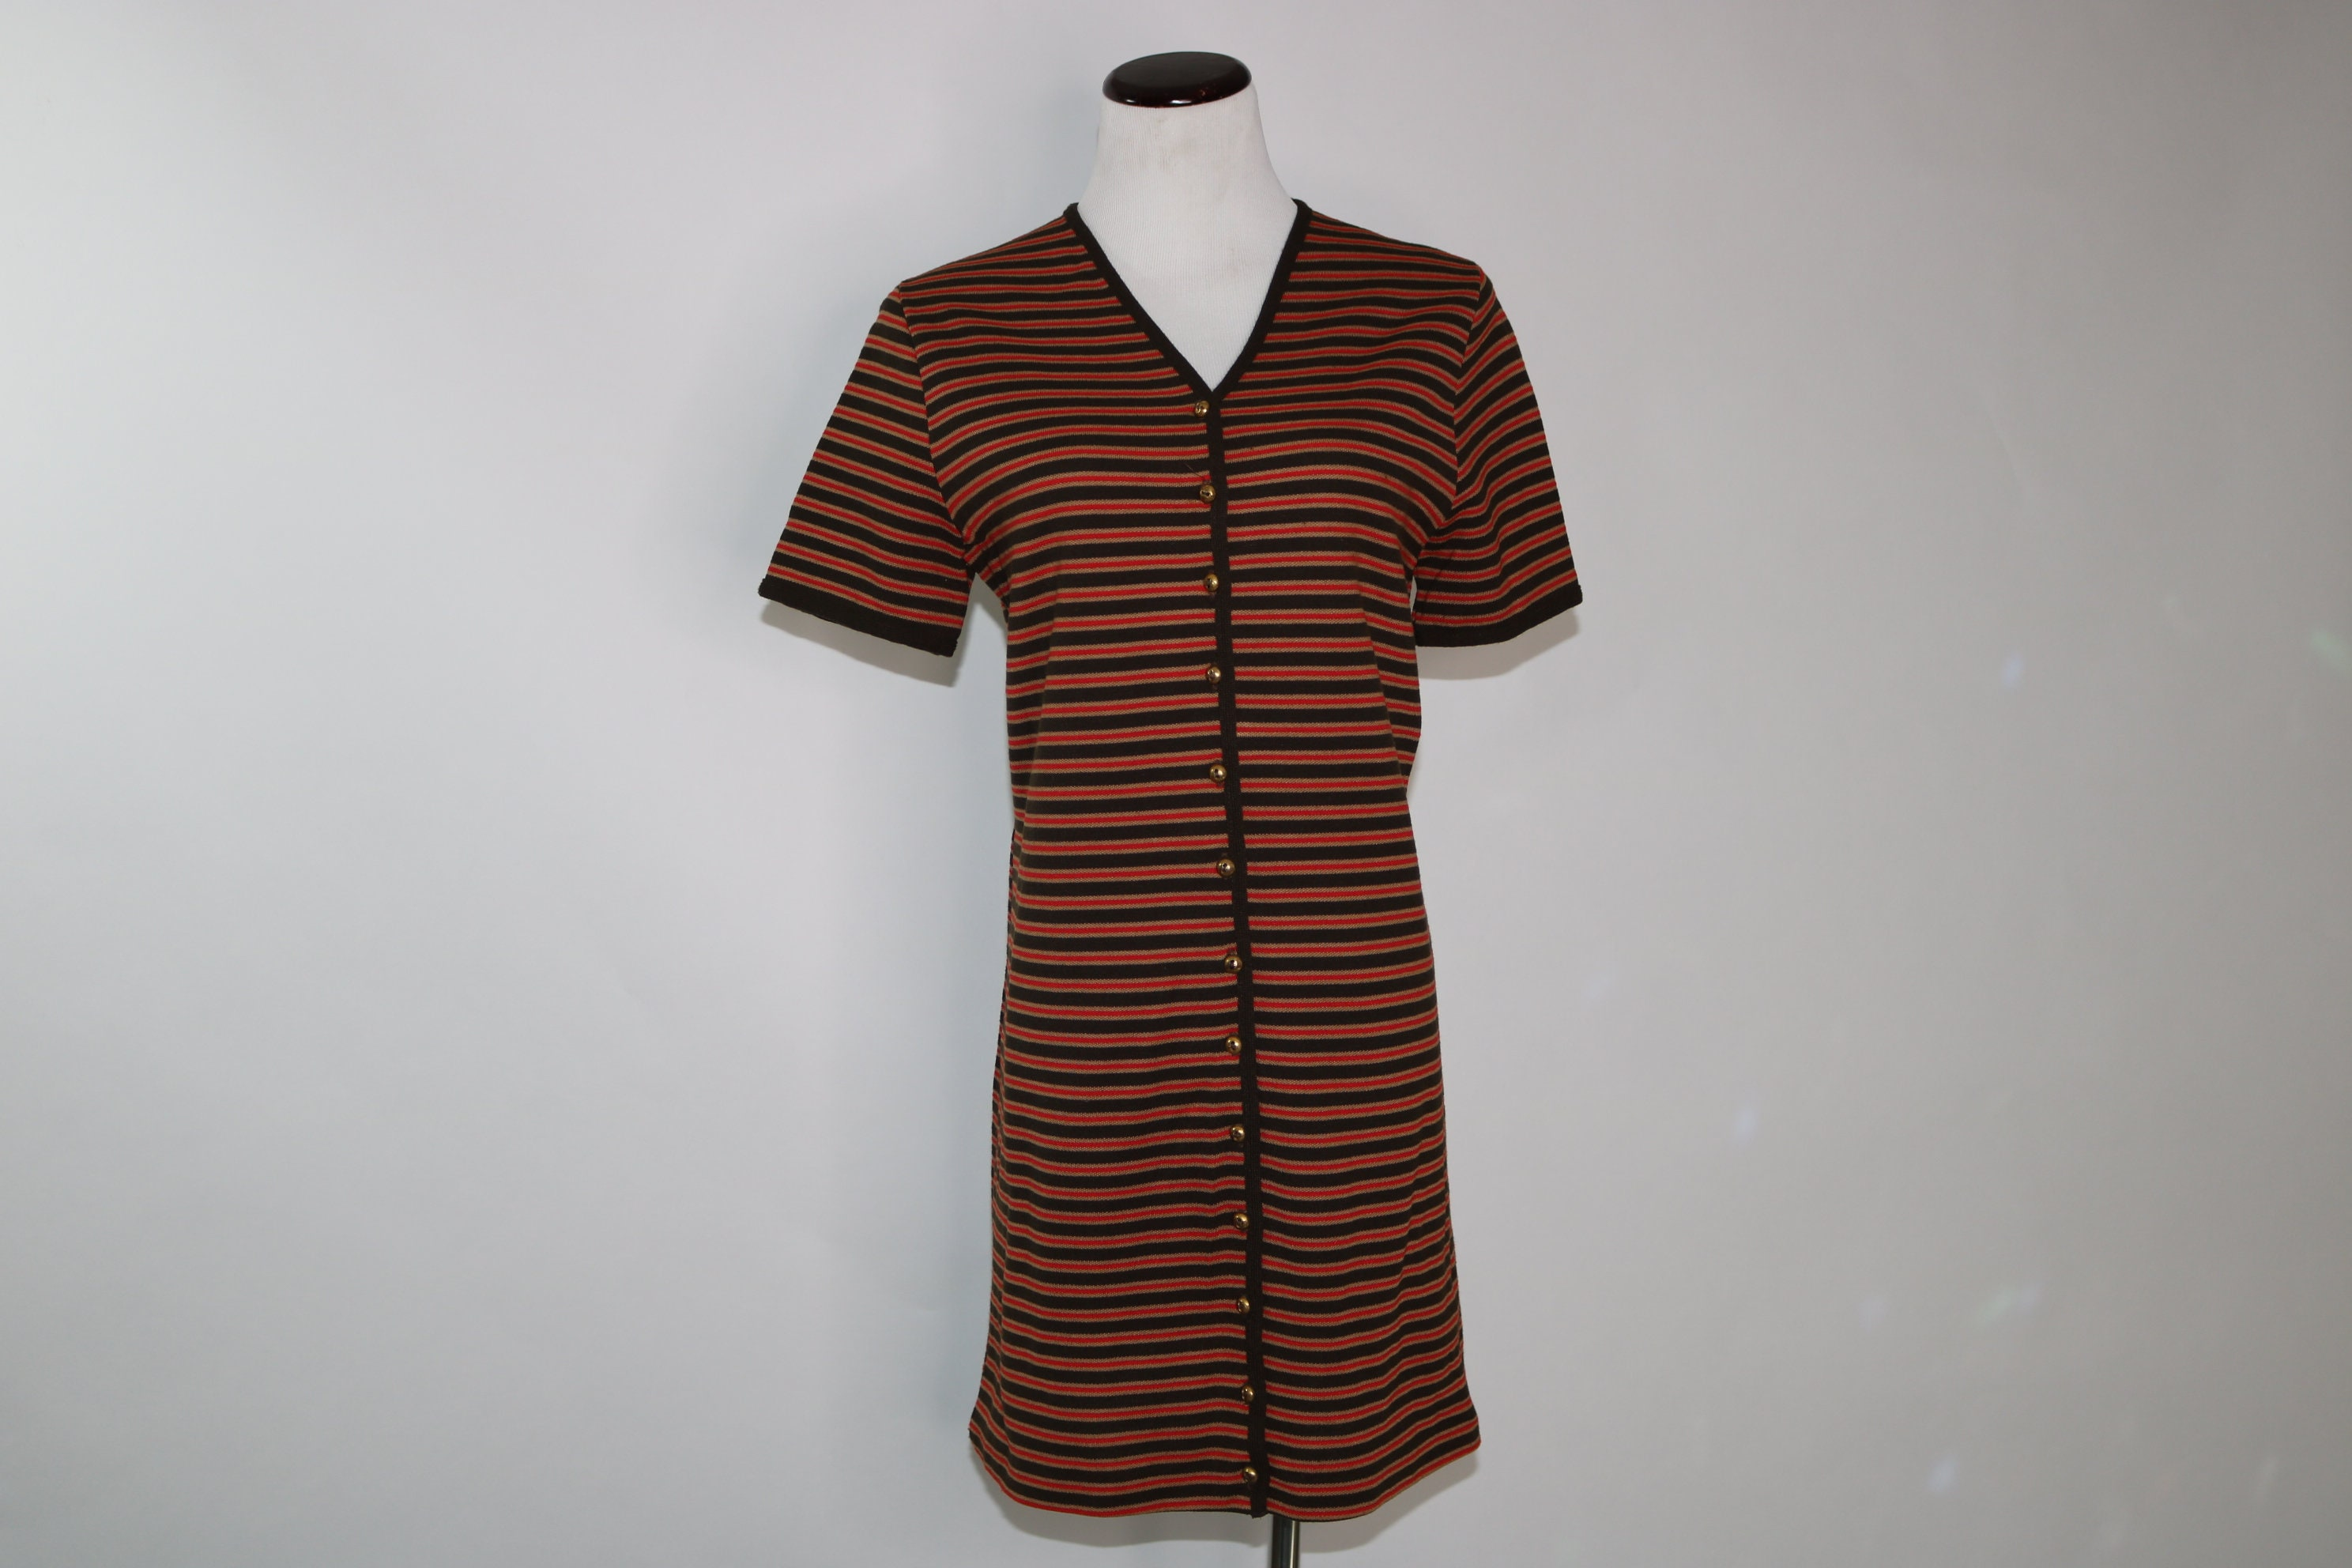 Vintage 60s 70s Mod Striped Sweater Dress Helen Whiting Medium  dd69c186b